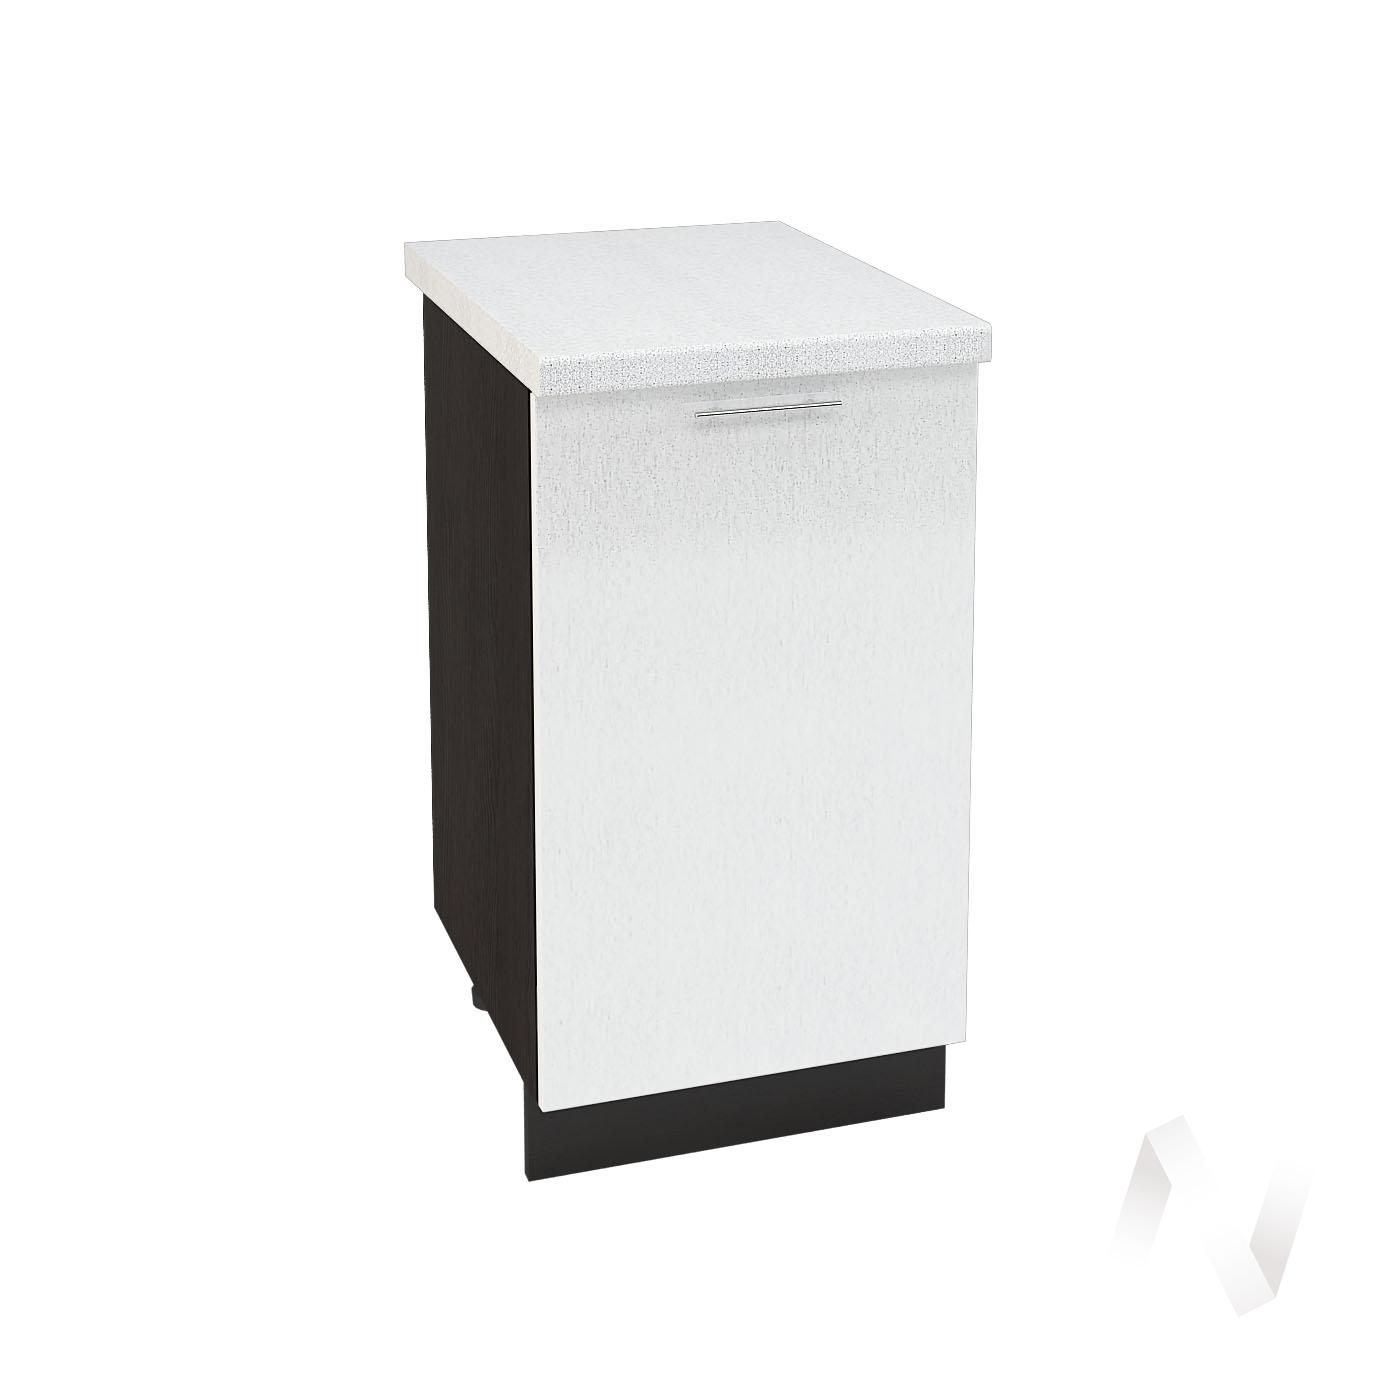 "Кухня ""Валерия-М"": Шкаф нижний 450, ШН 450 (дождь серый/корпус венге)"